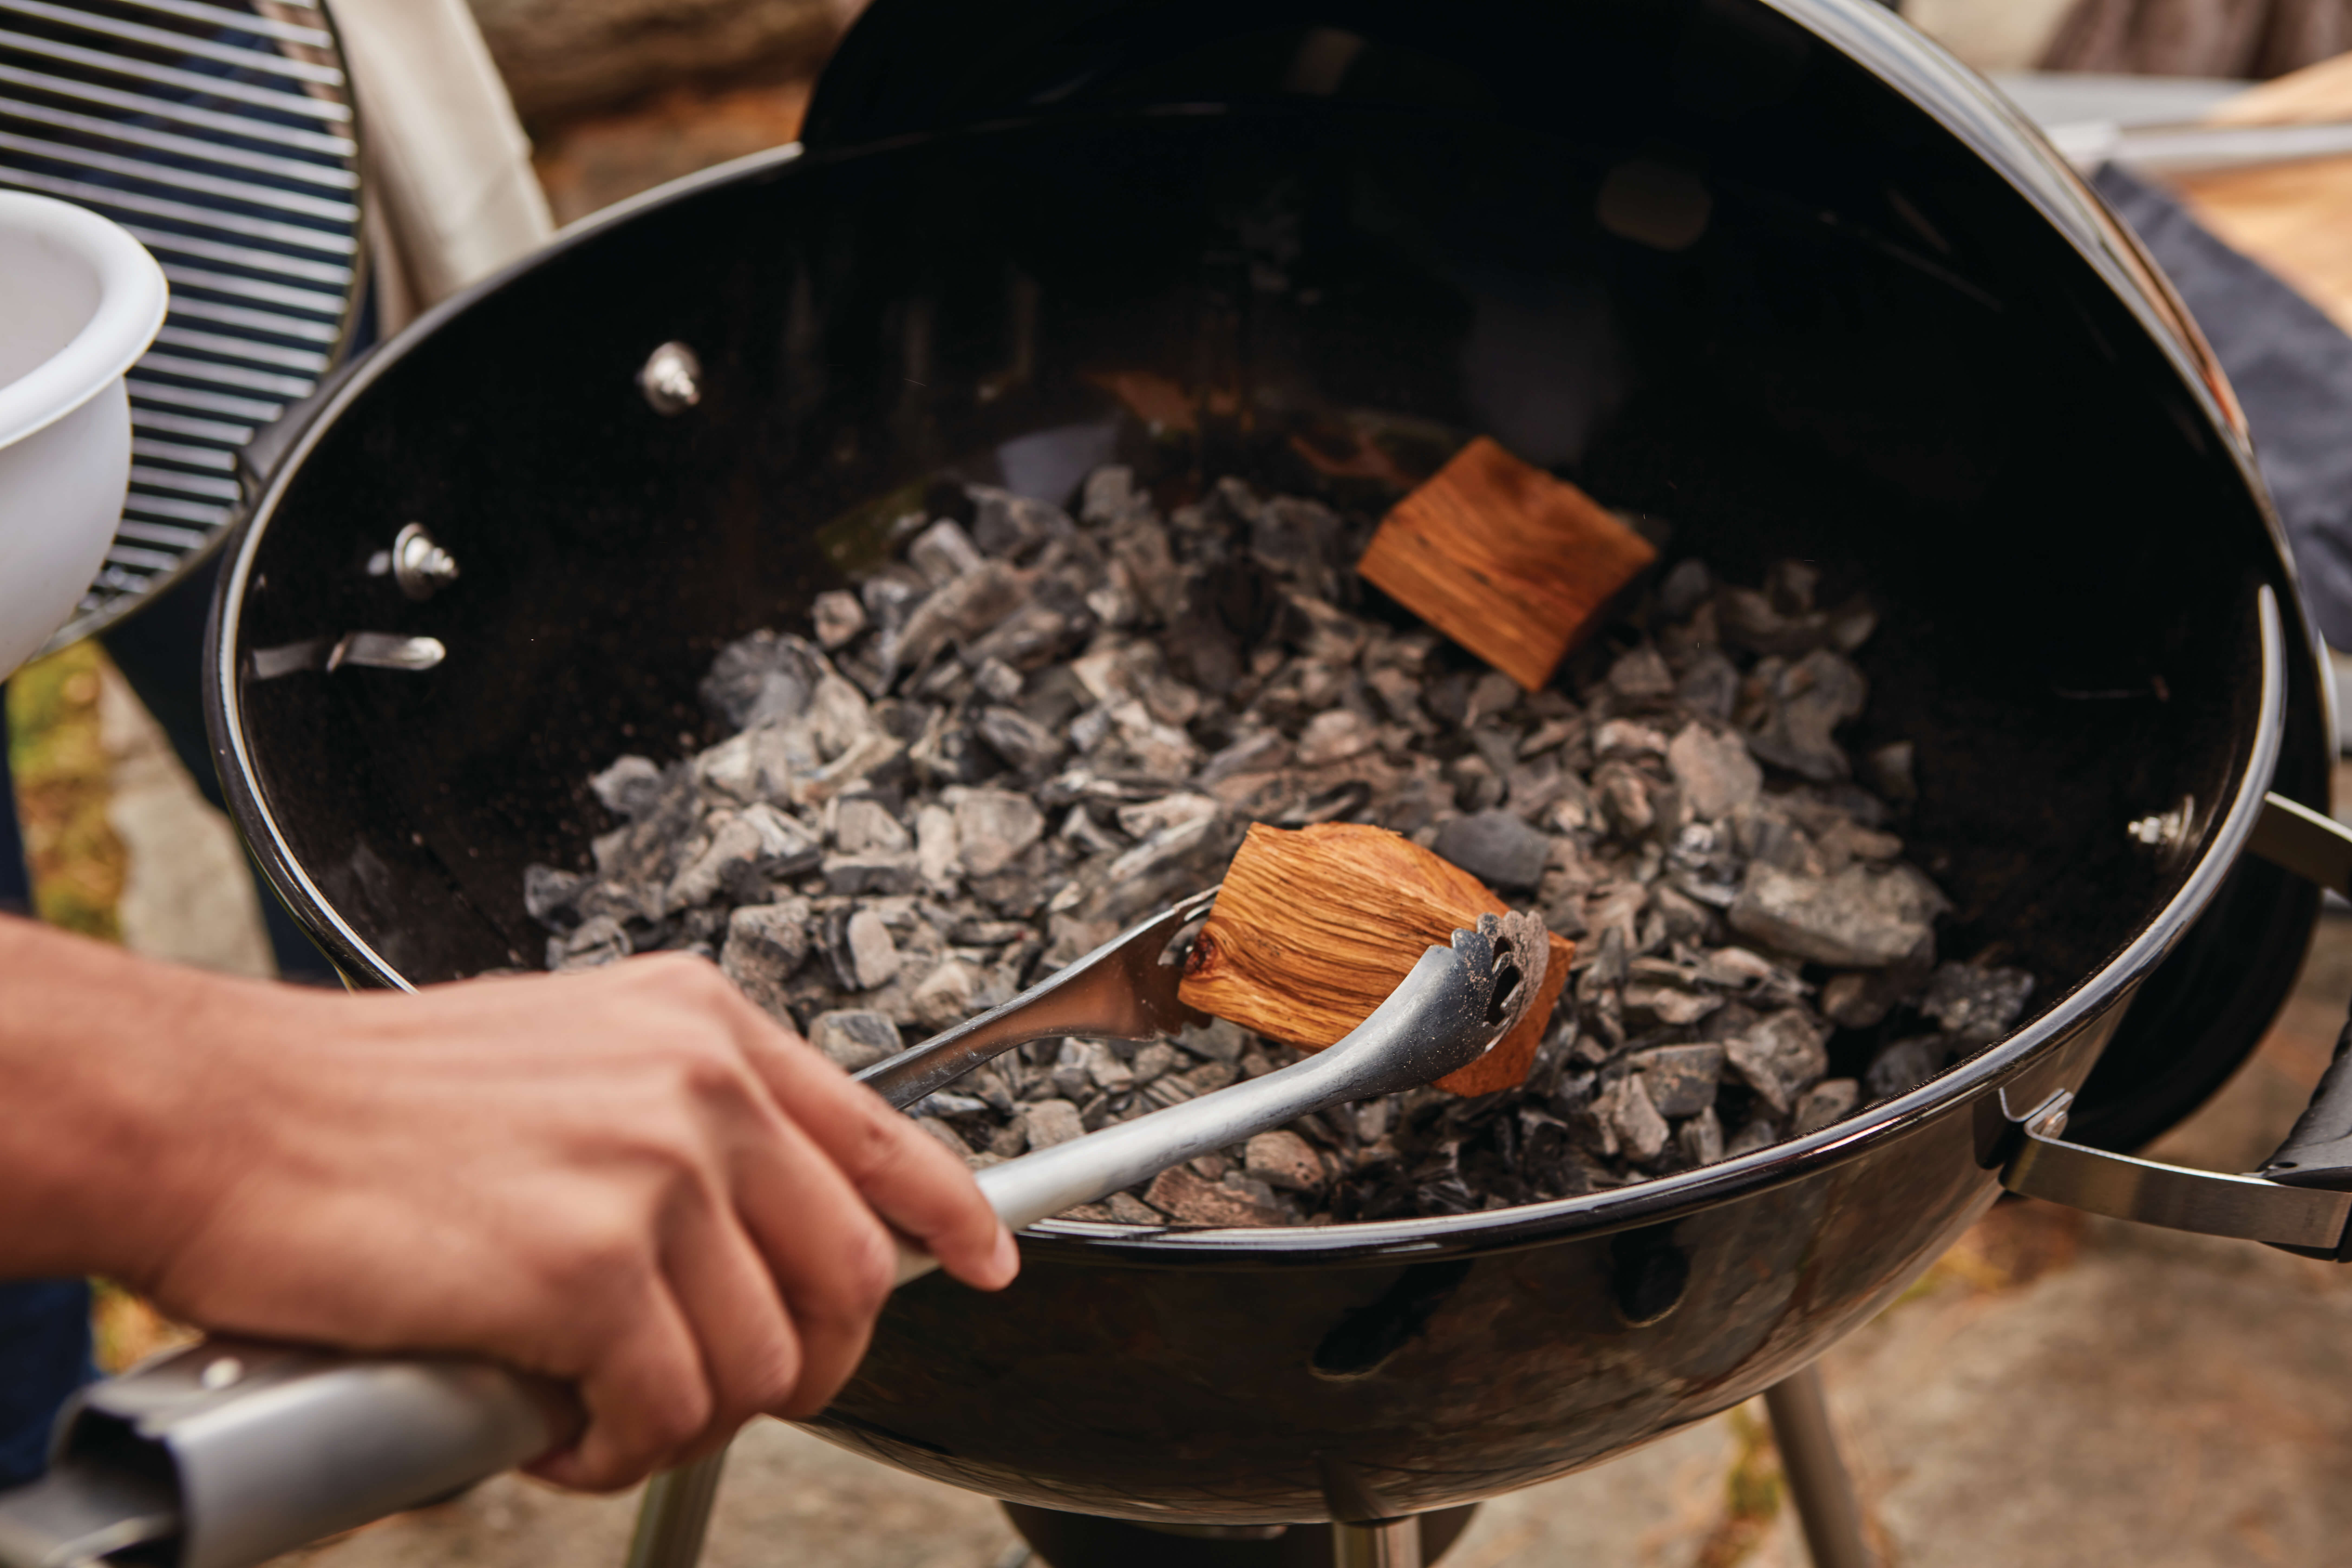 charcoal-nk22-life-detail-wood-chunks-1.jpg